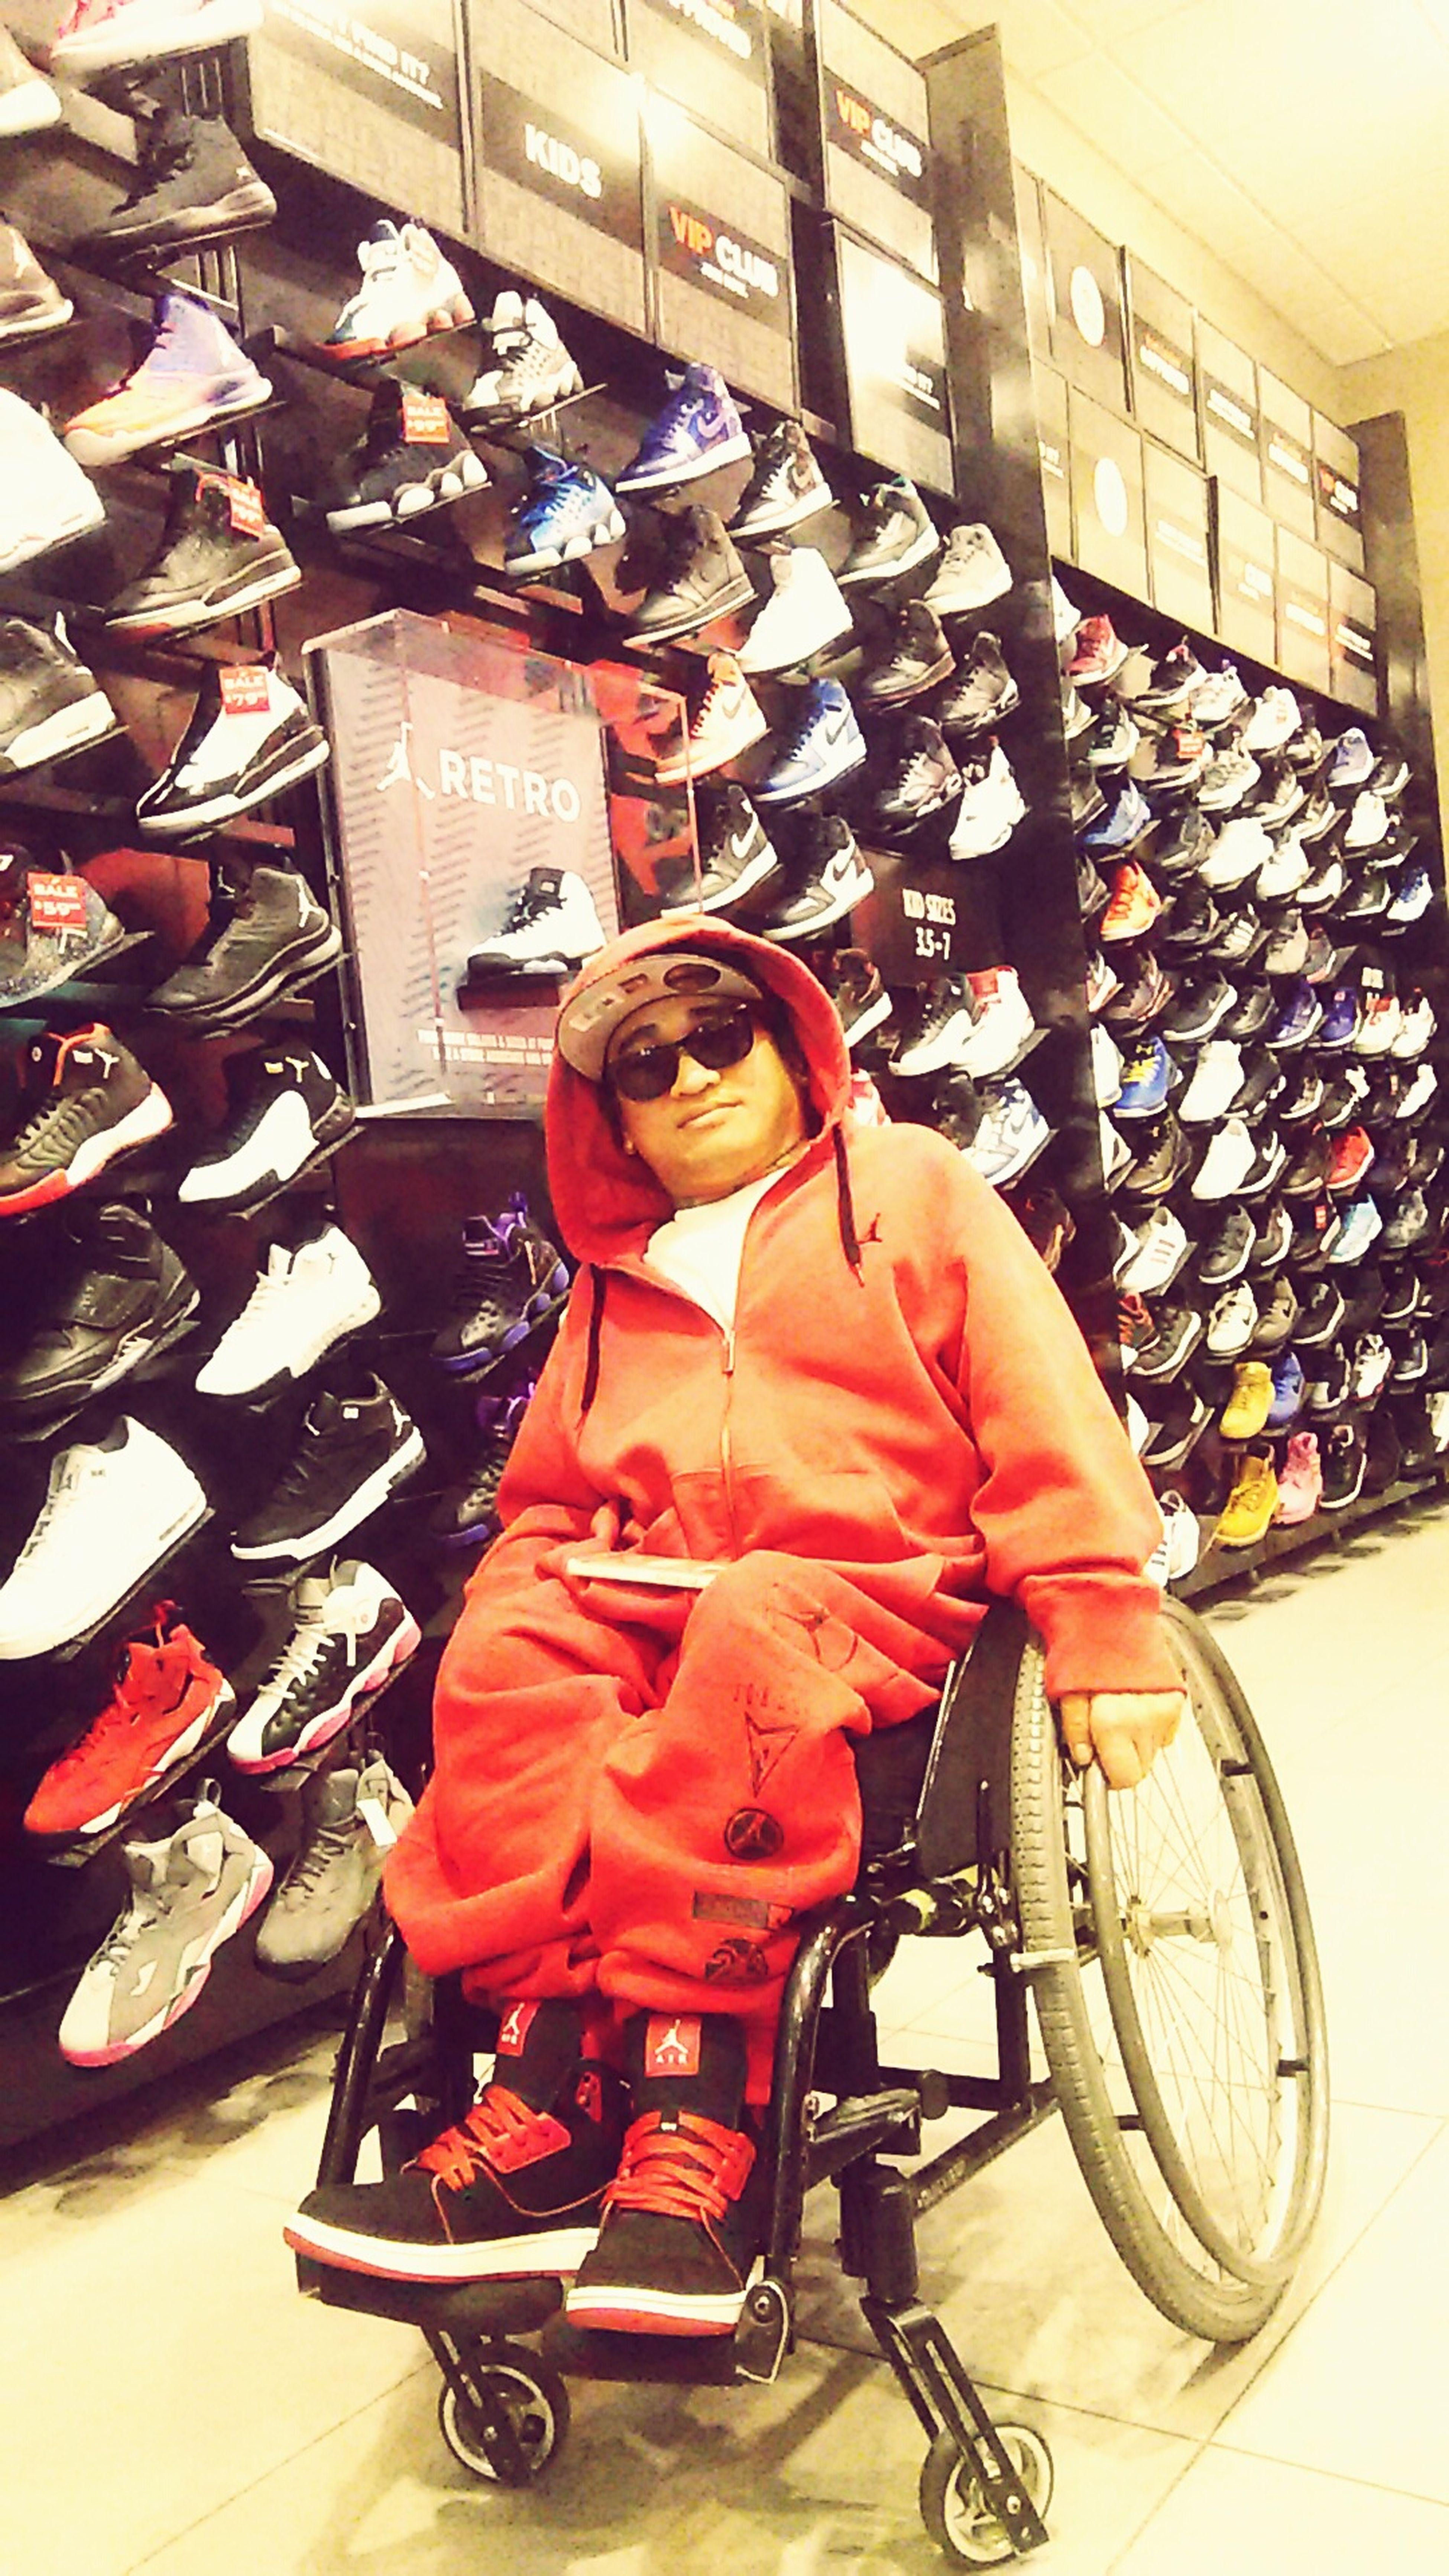 Homie YB Stay Fresh Swag Sneaker Game Bet Stunt Like This Fasho